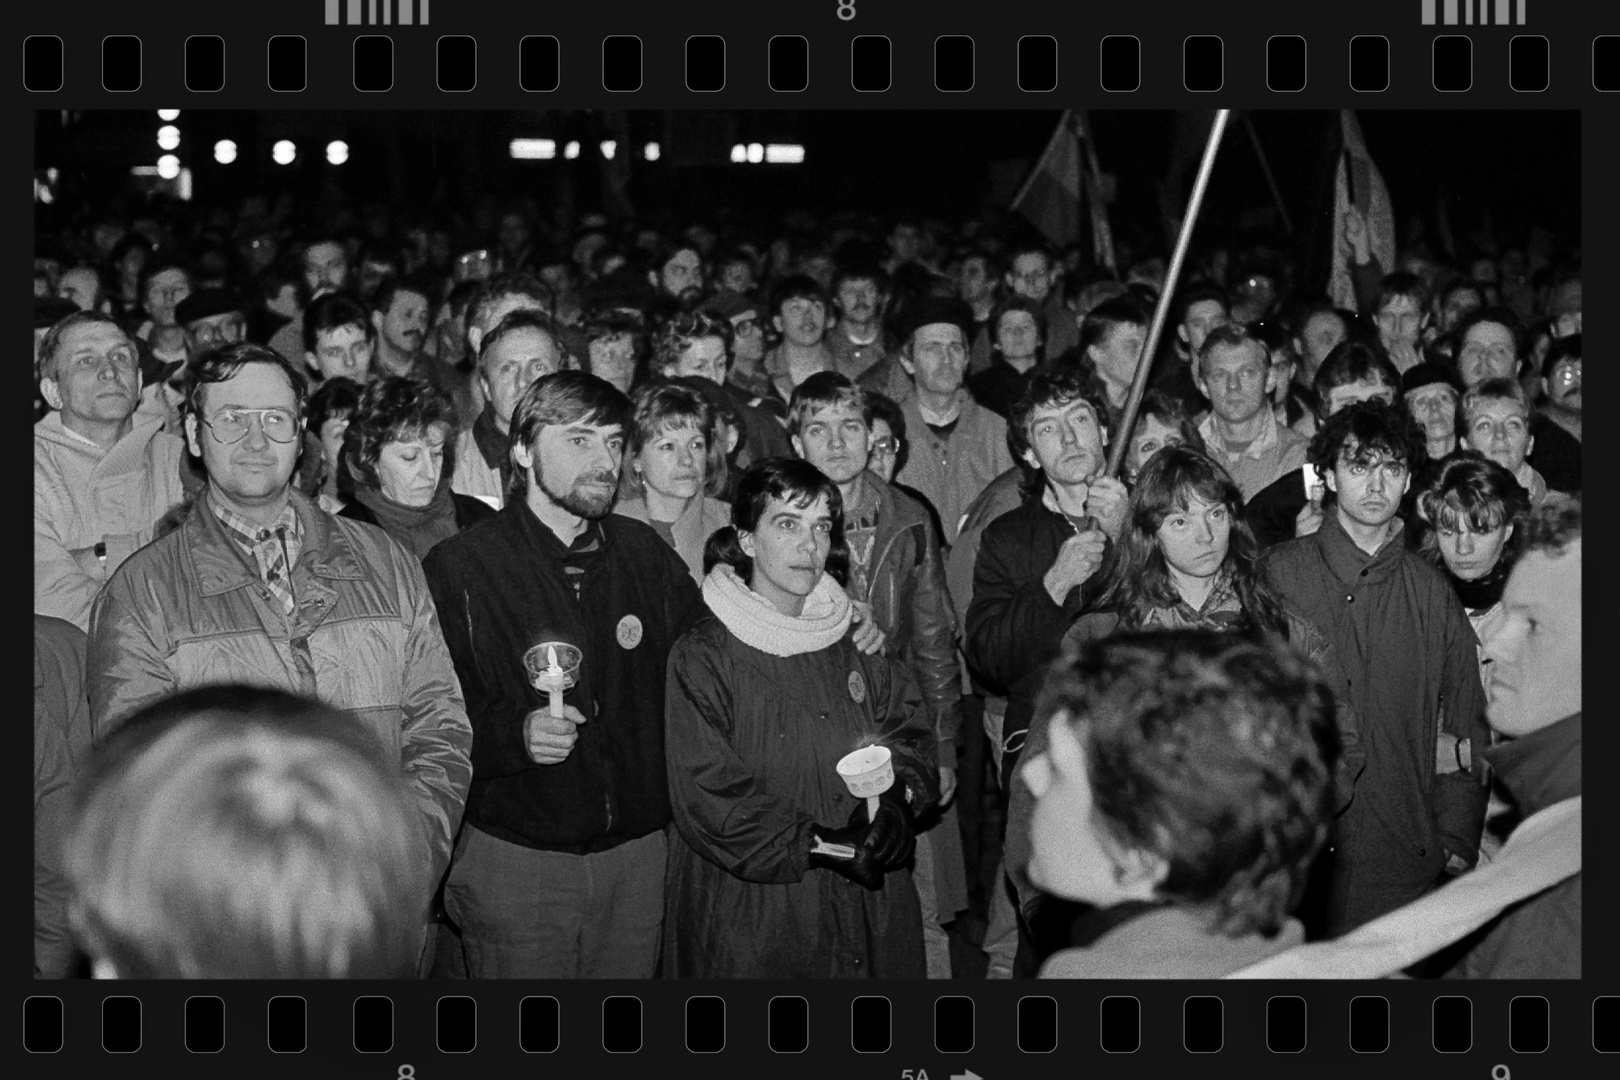 Rückblick: Mahnwache 1989 in Rostock